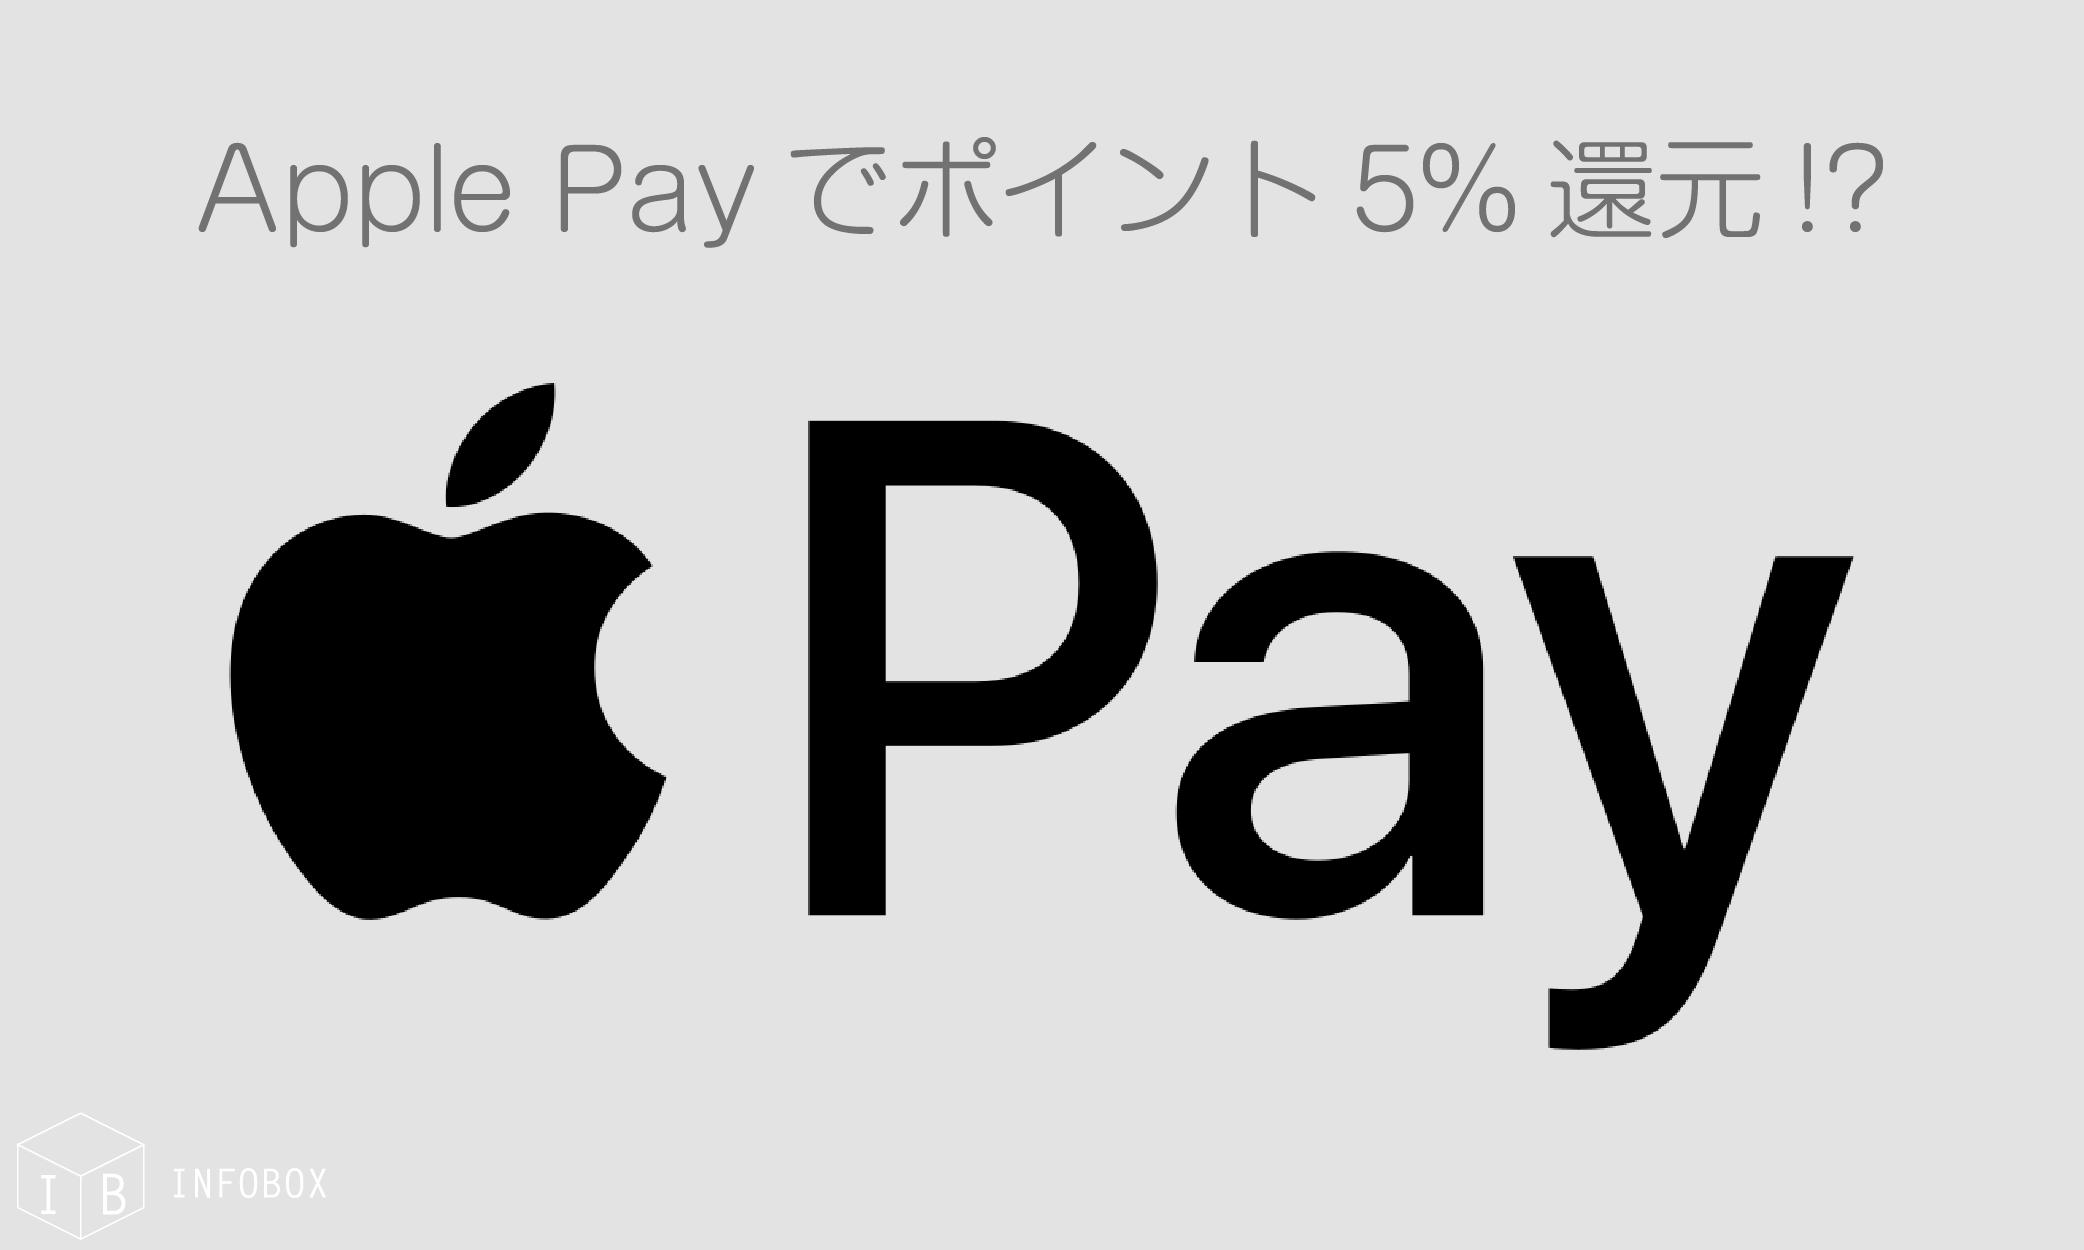 applepayでポイント還元5%